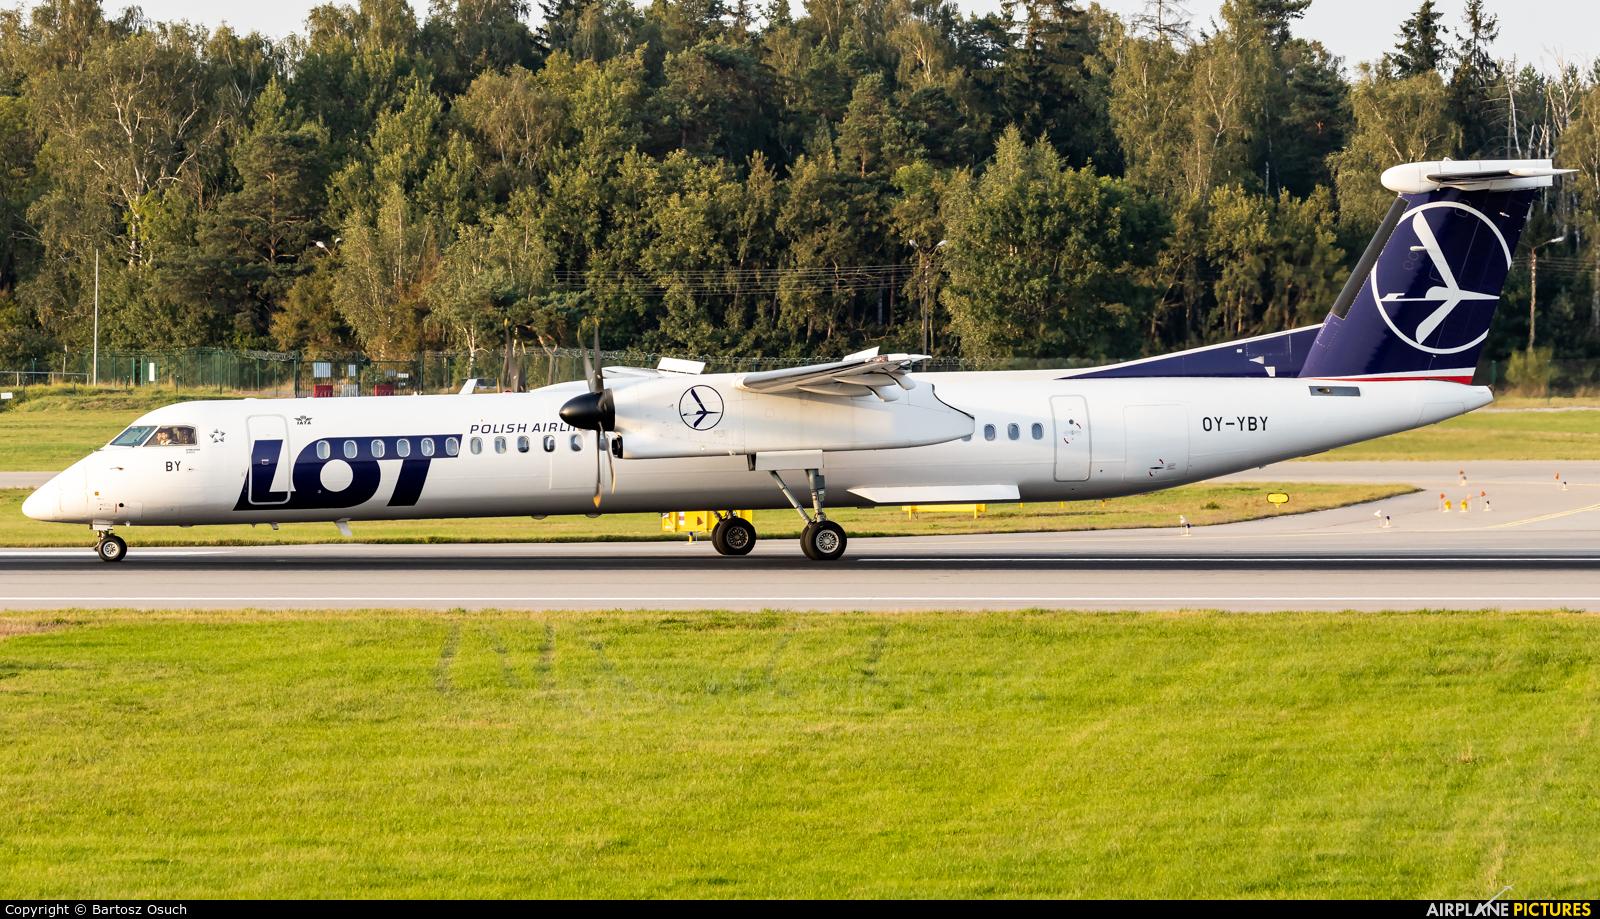 LOT - Polish Airlines OY-YBY aircraft at Gdańsk - Lech Wałęsa